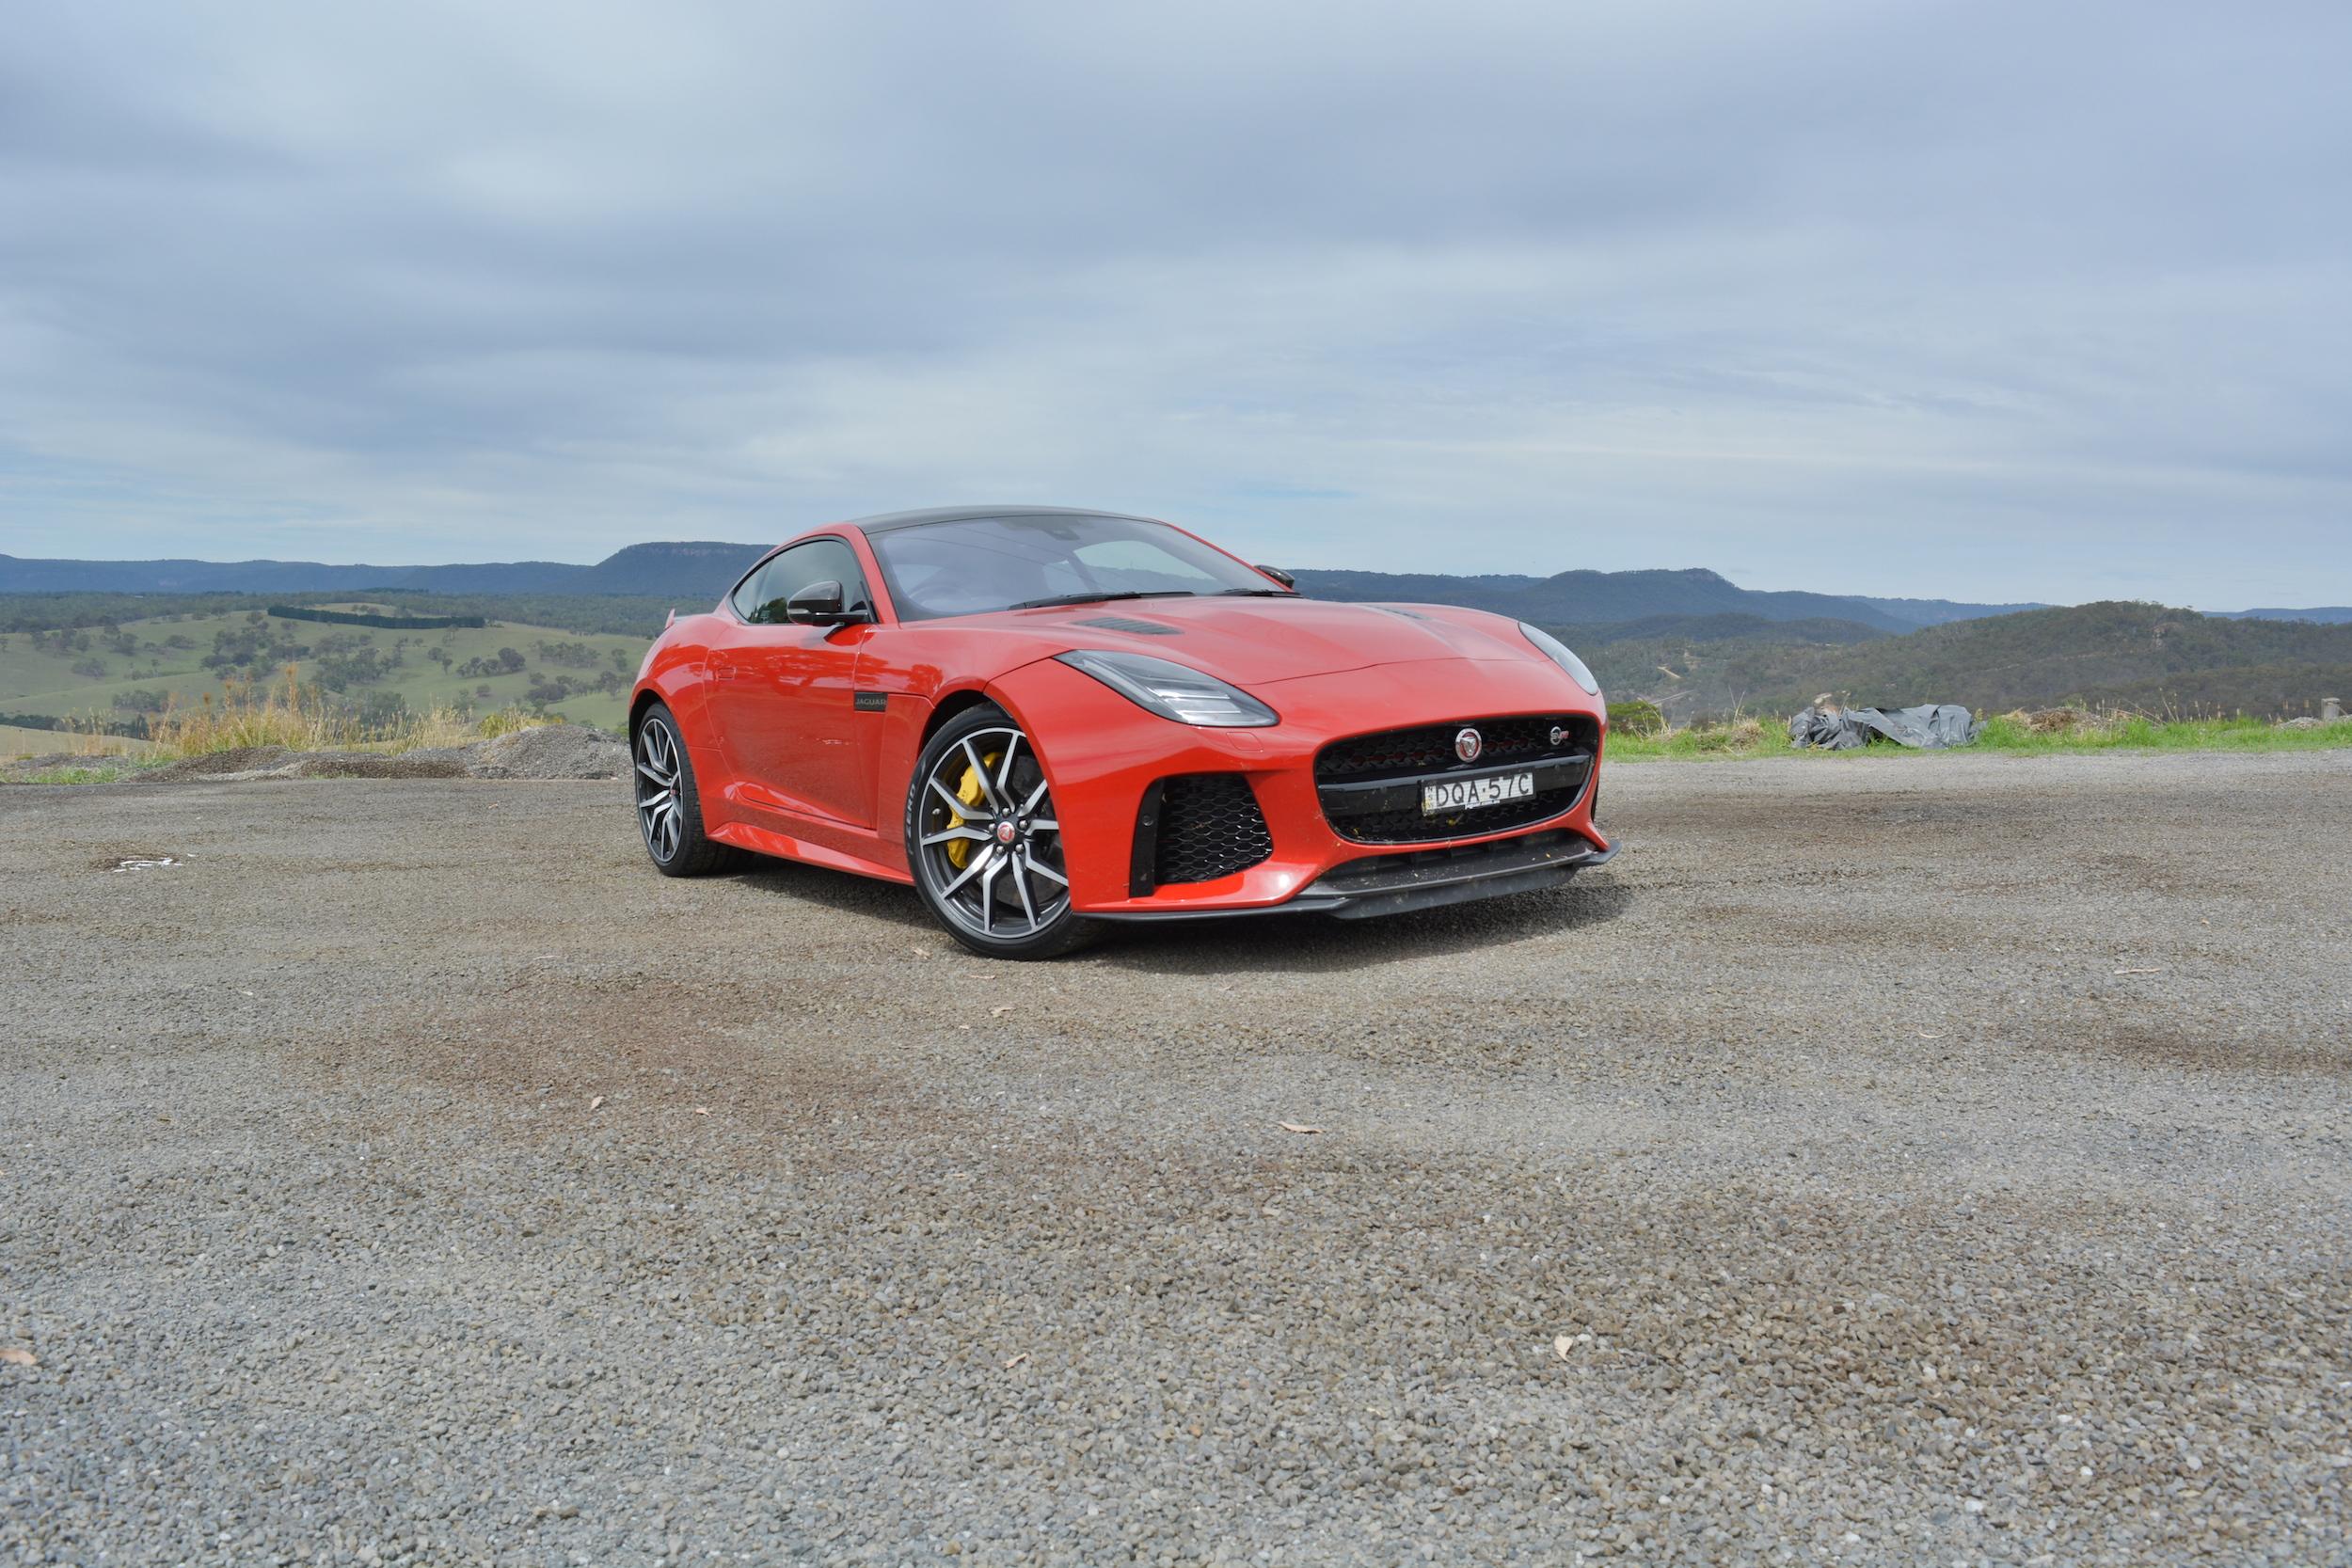 2018 Jaguar F-Type SVR new car review